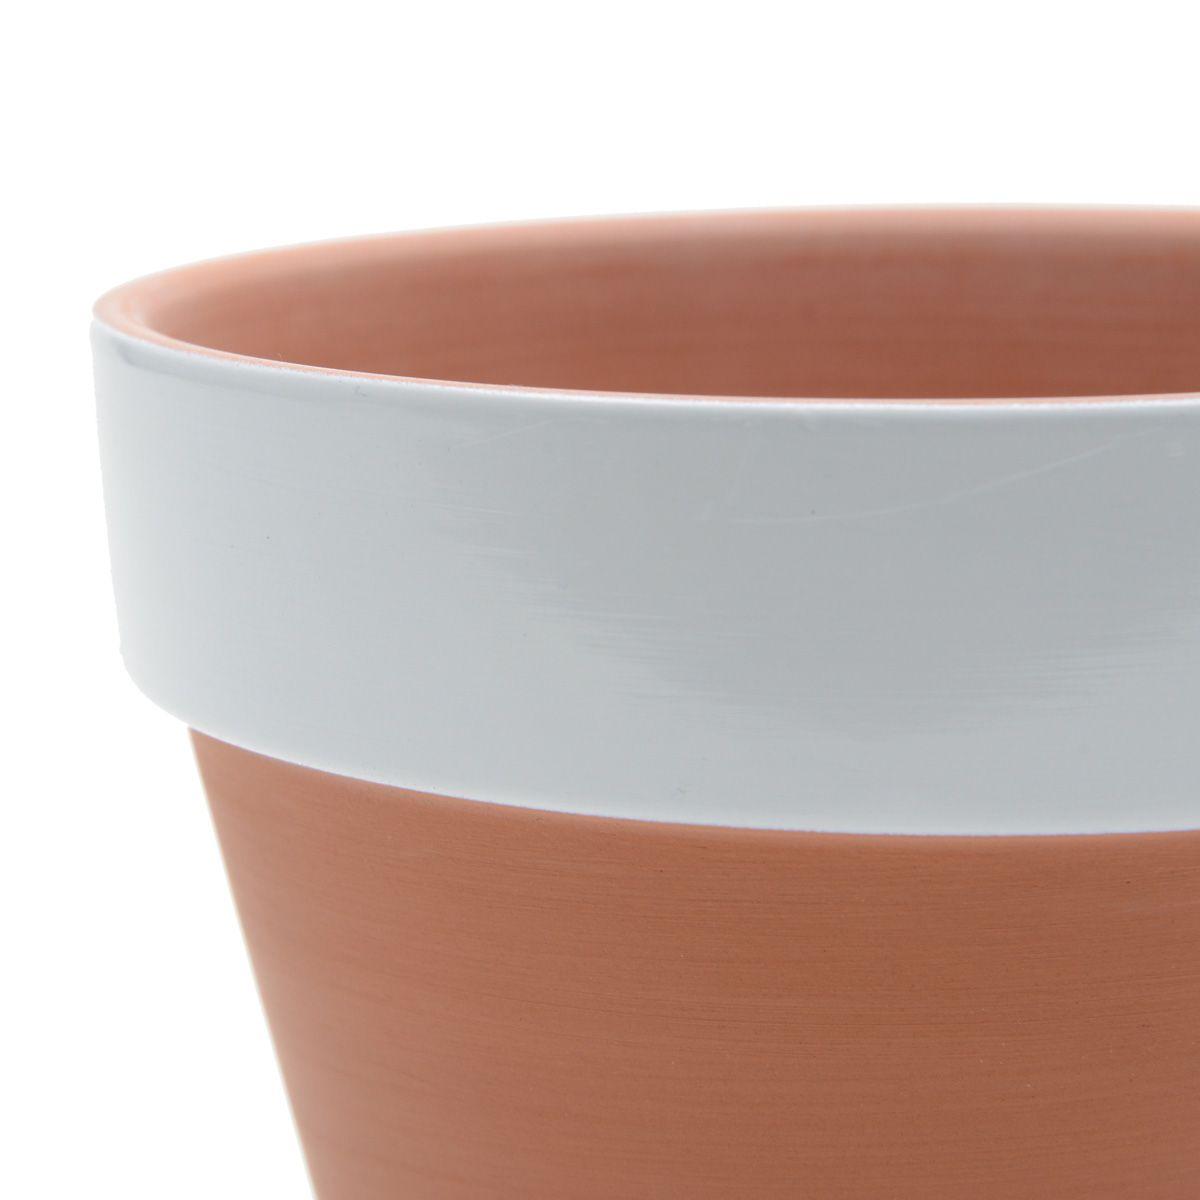 Vaso de Cerâmica Redondo cor Terracota com Borda Branca 13cm x 15cm - 43085